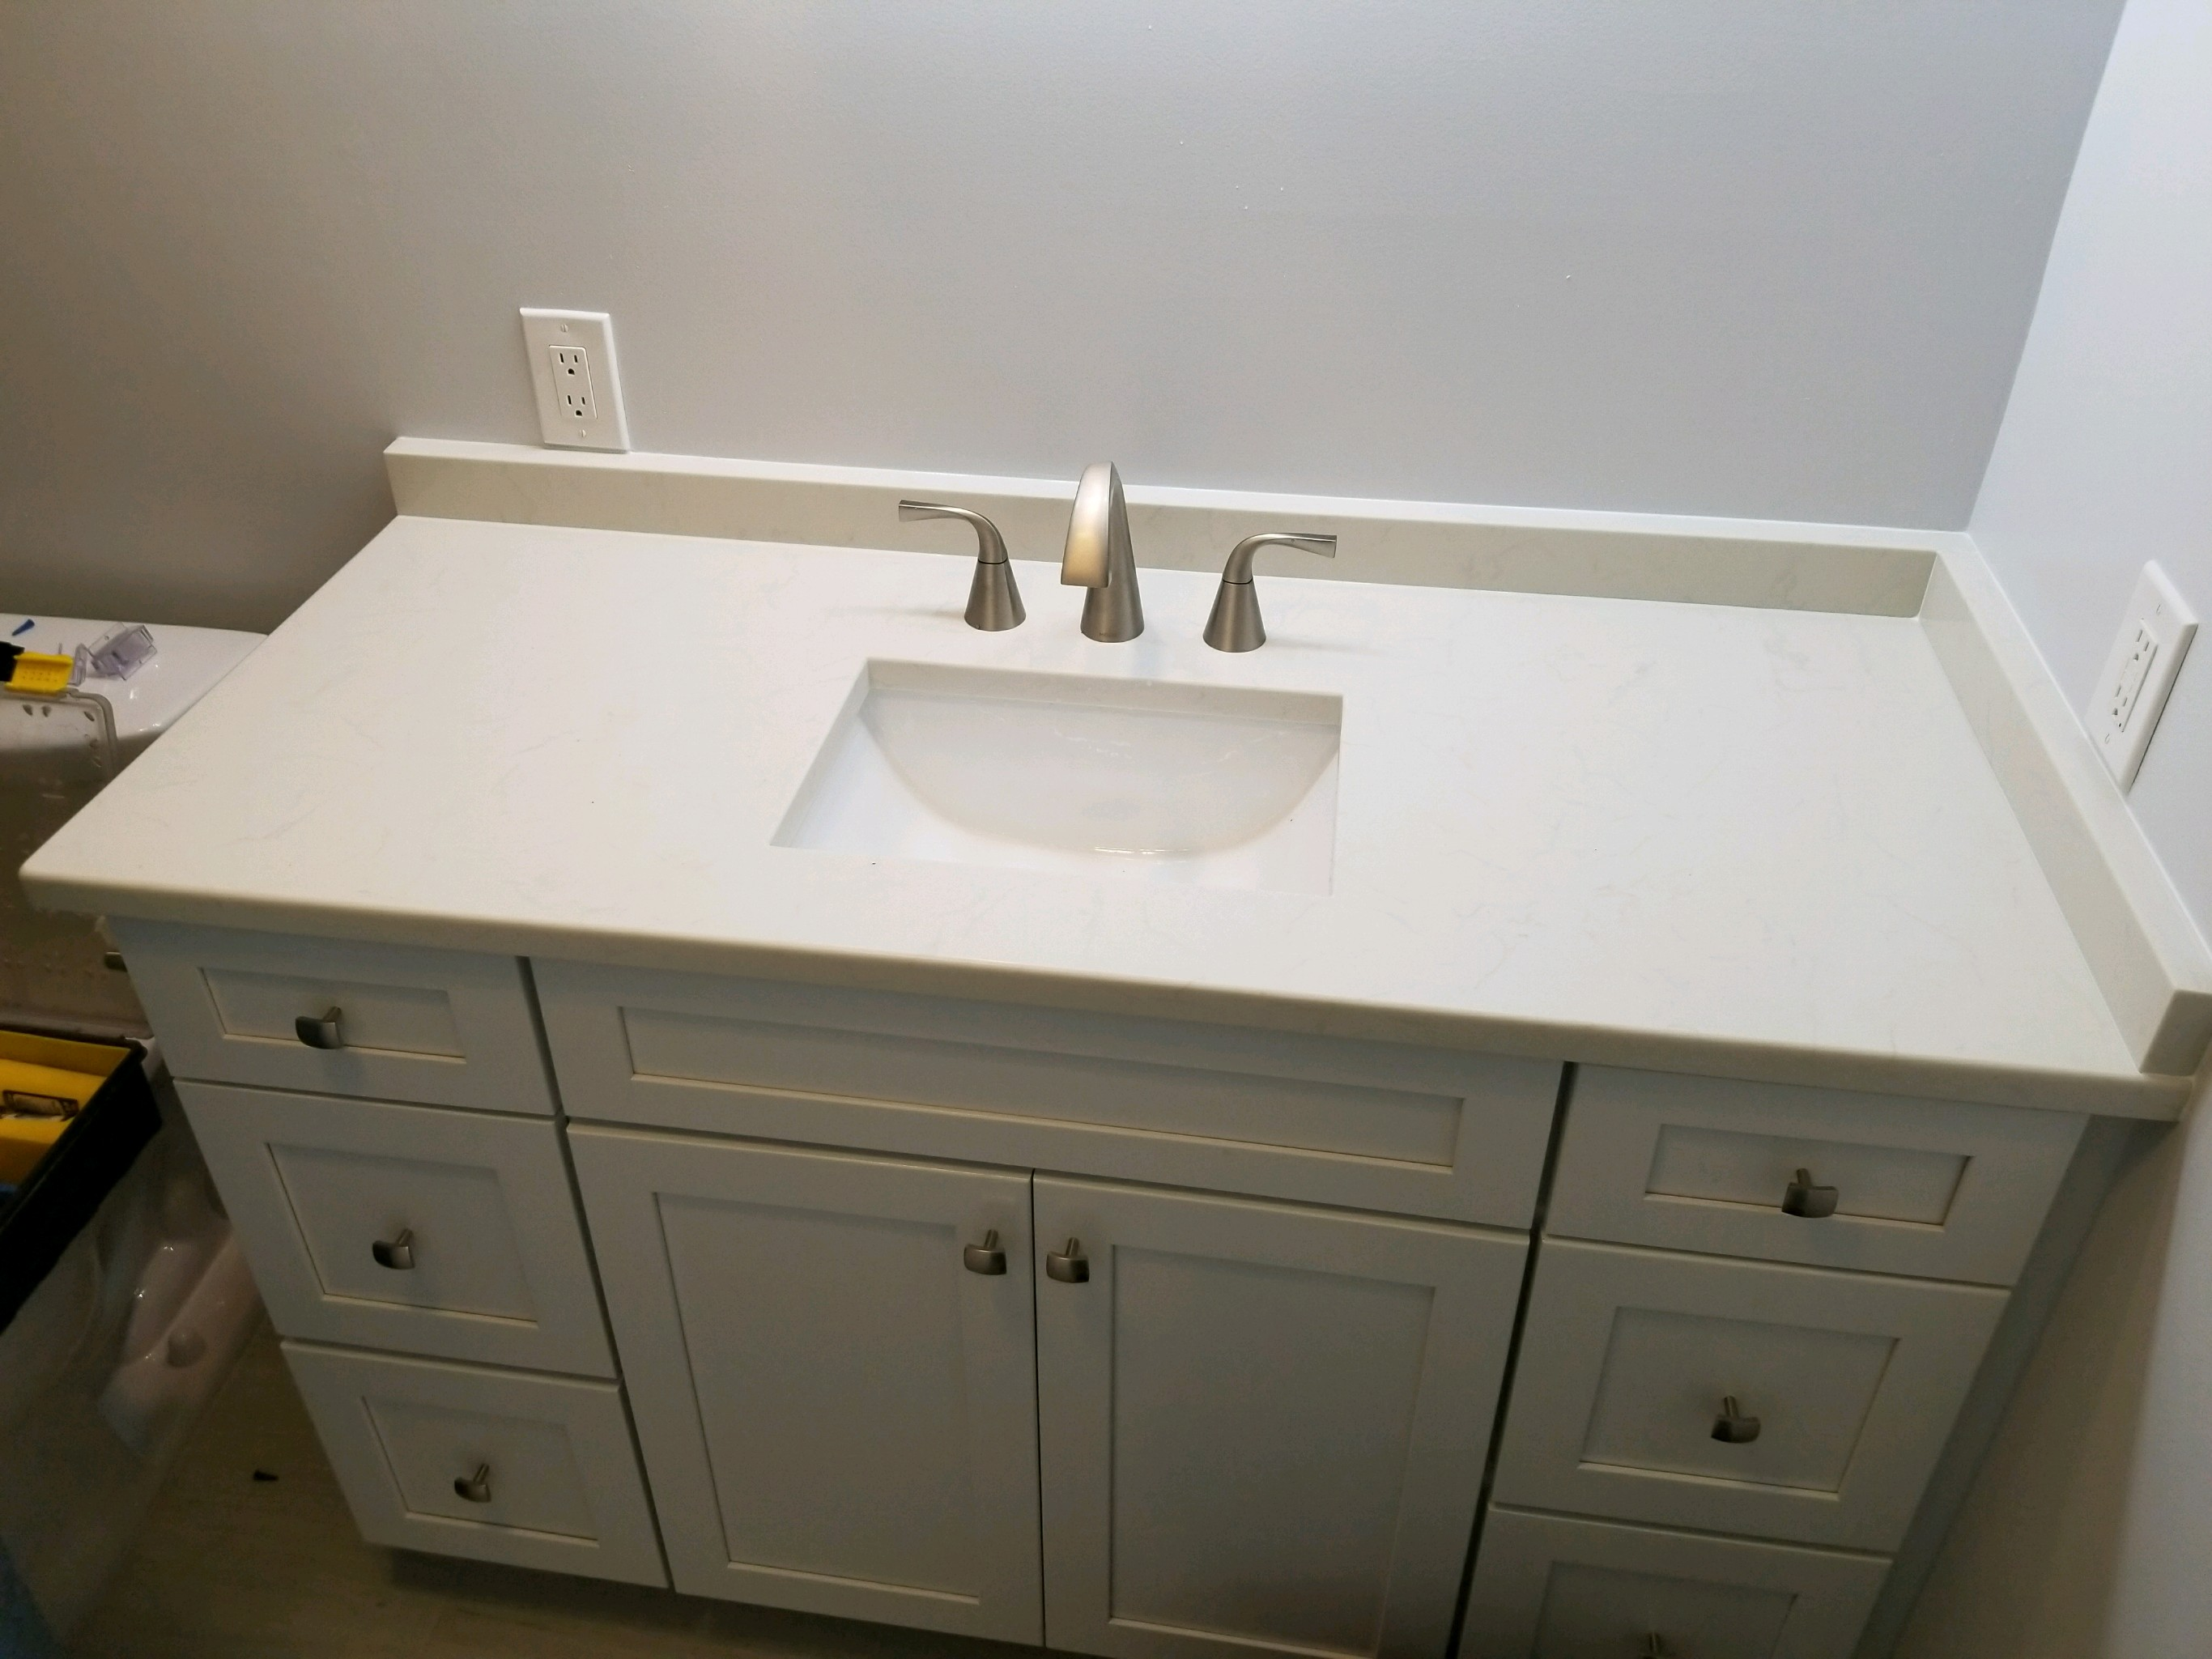 Pelican Winter White Quartz Bathroom Vanity Countertop Remodel In - Bathroom cabinets tampa fl